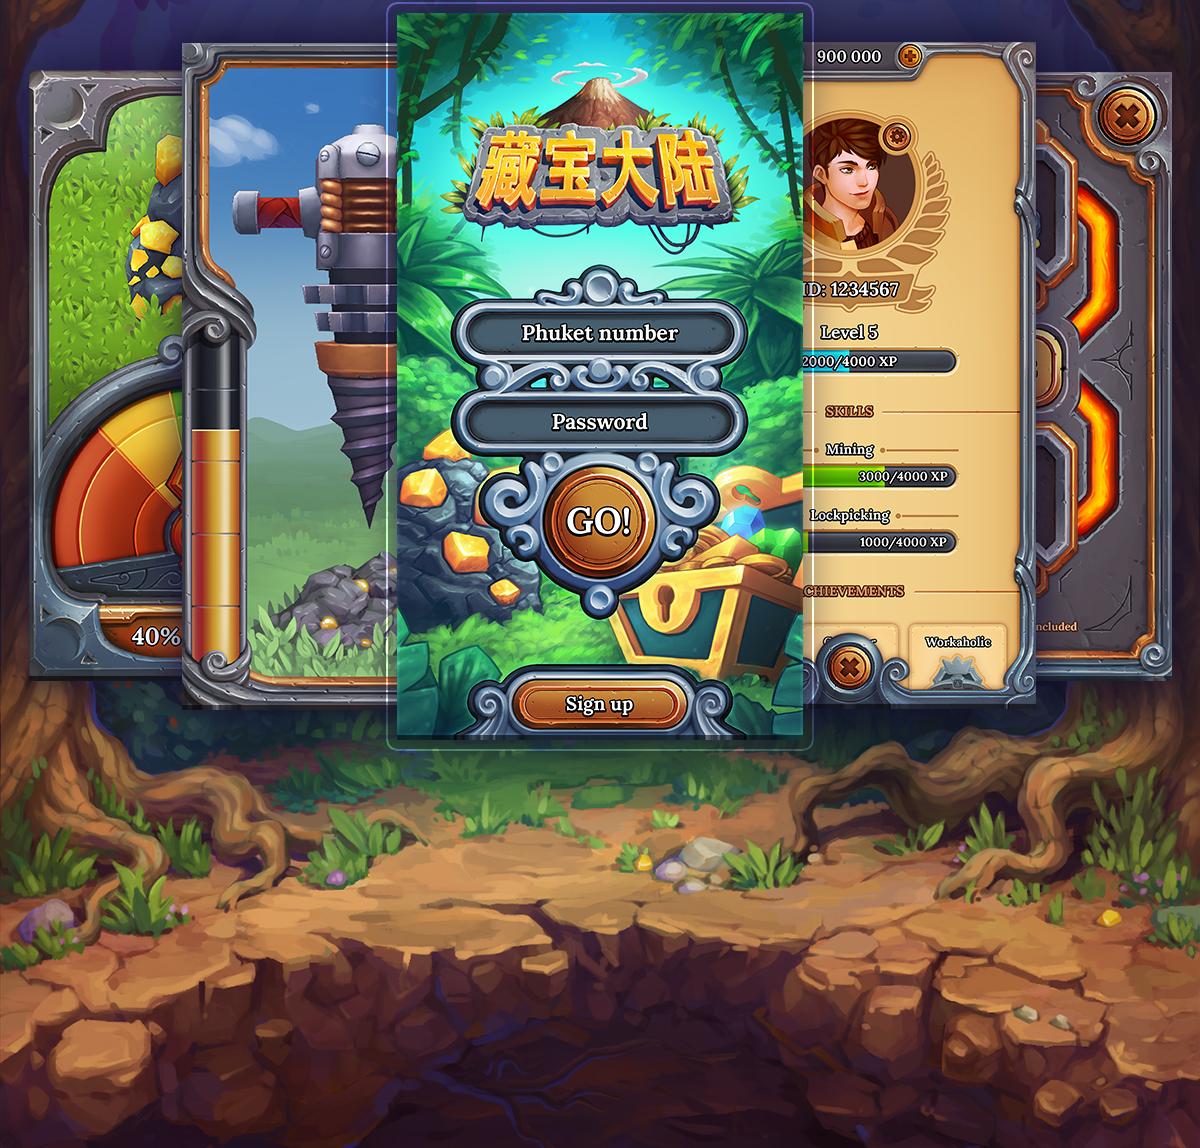 Mobile Game Art and UI Design - RocketBrush Studio